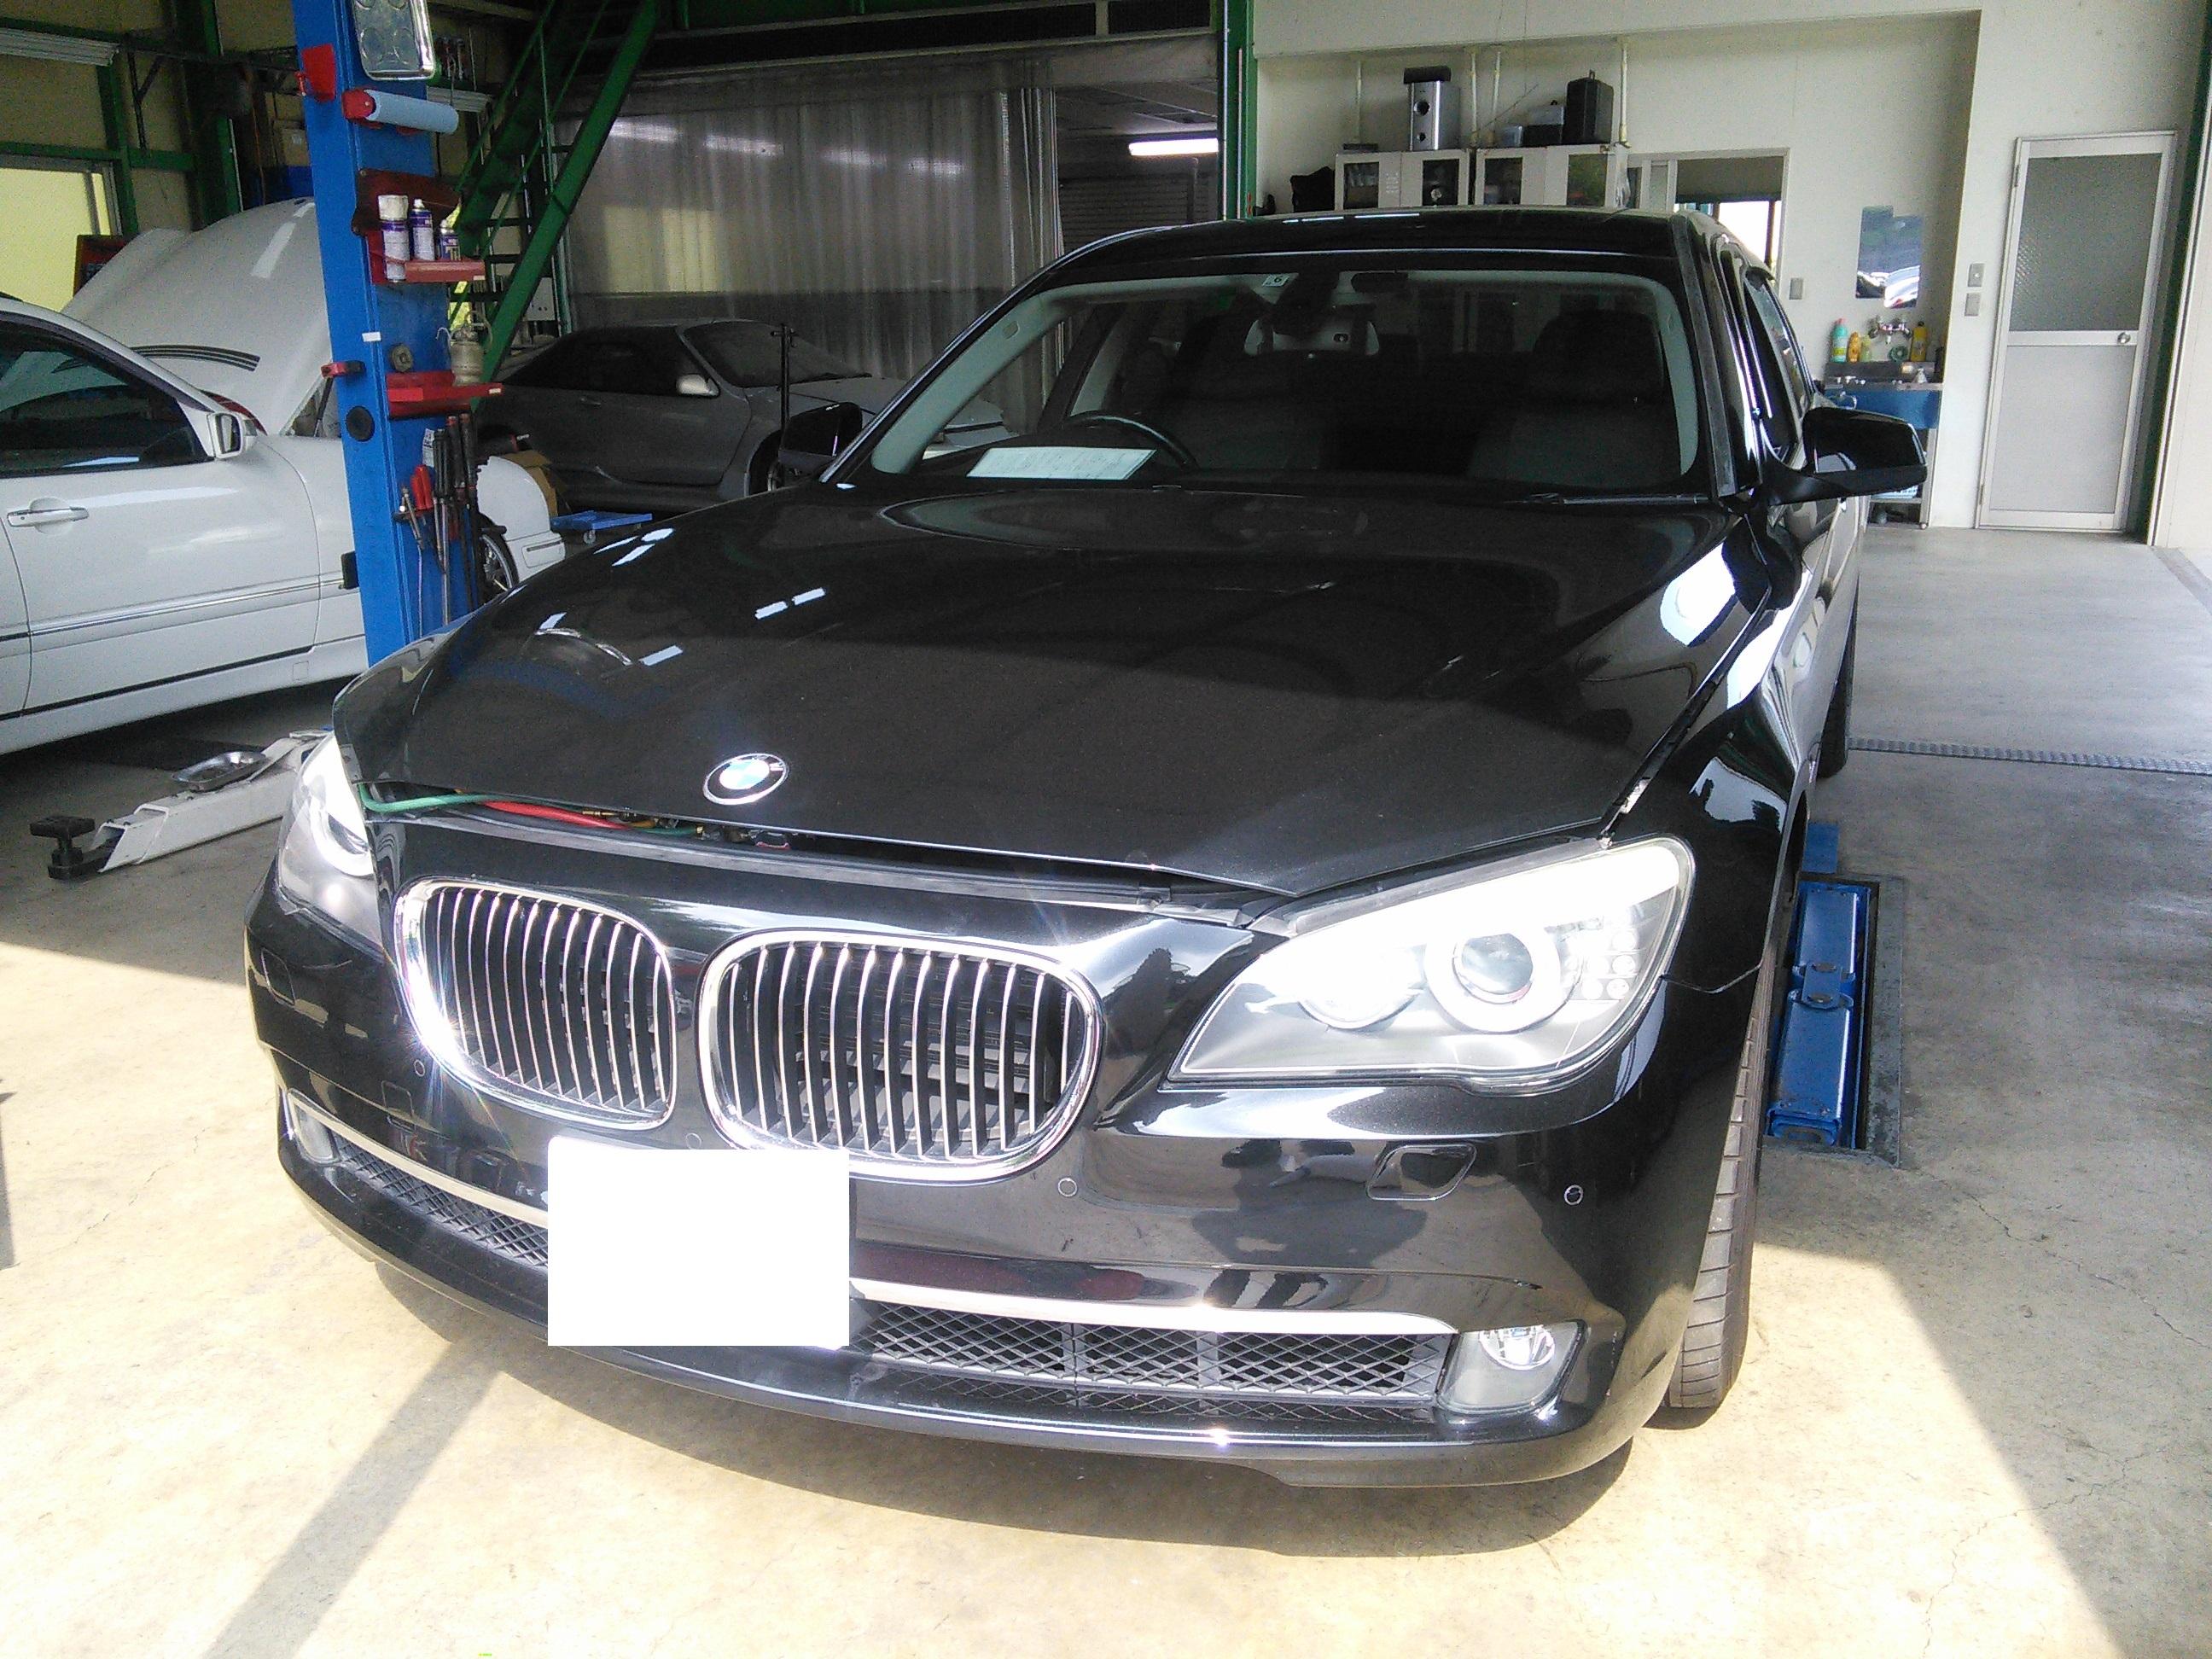 BMW 740 エアコン修理  ガス漏れ コンプレッサーNG 配管洗浄